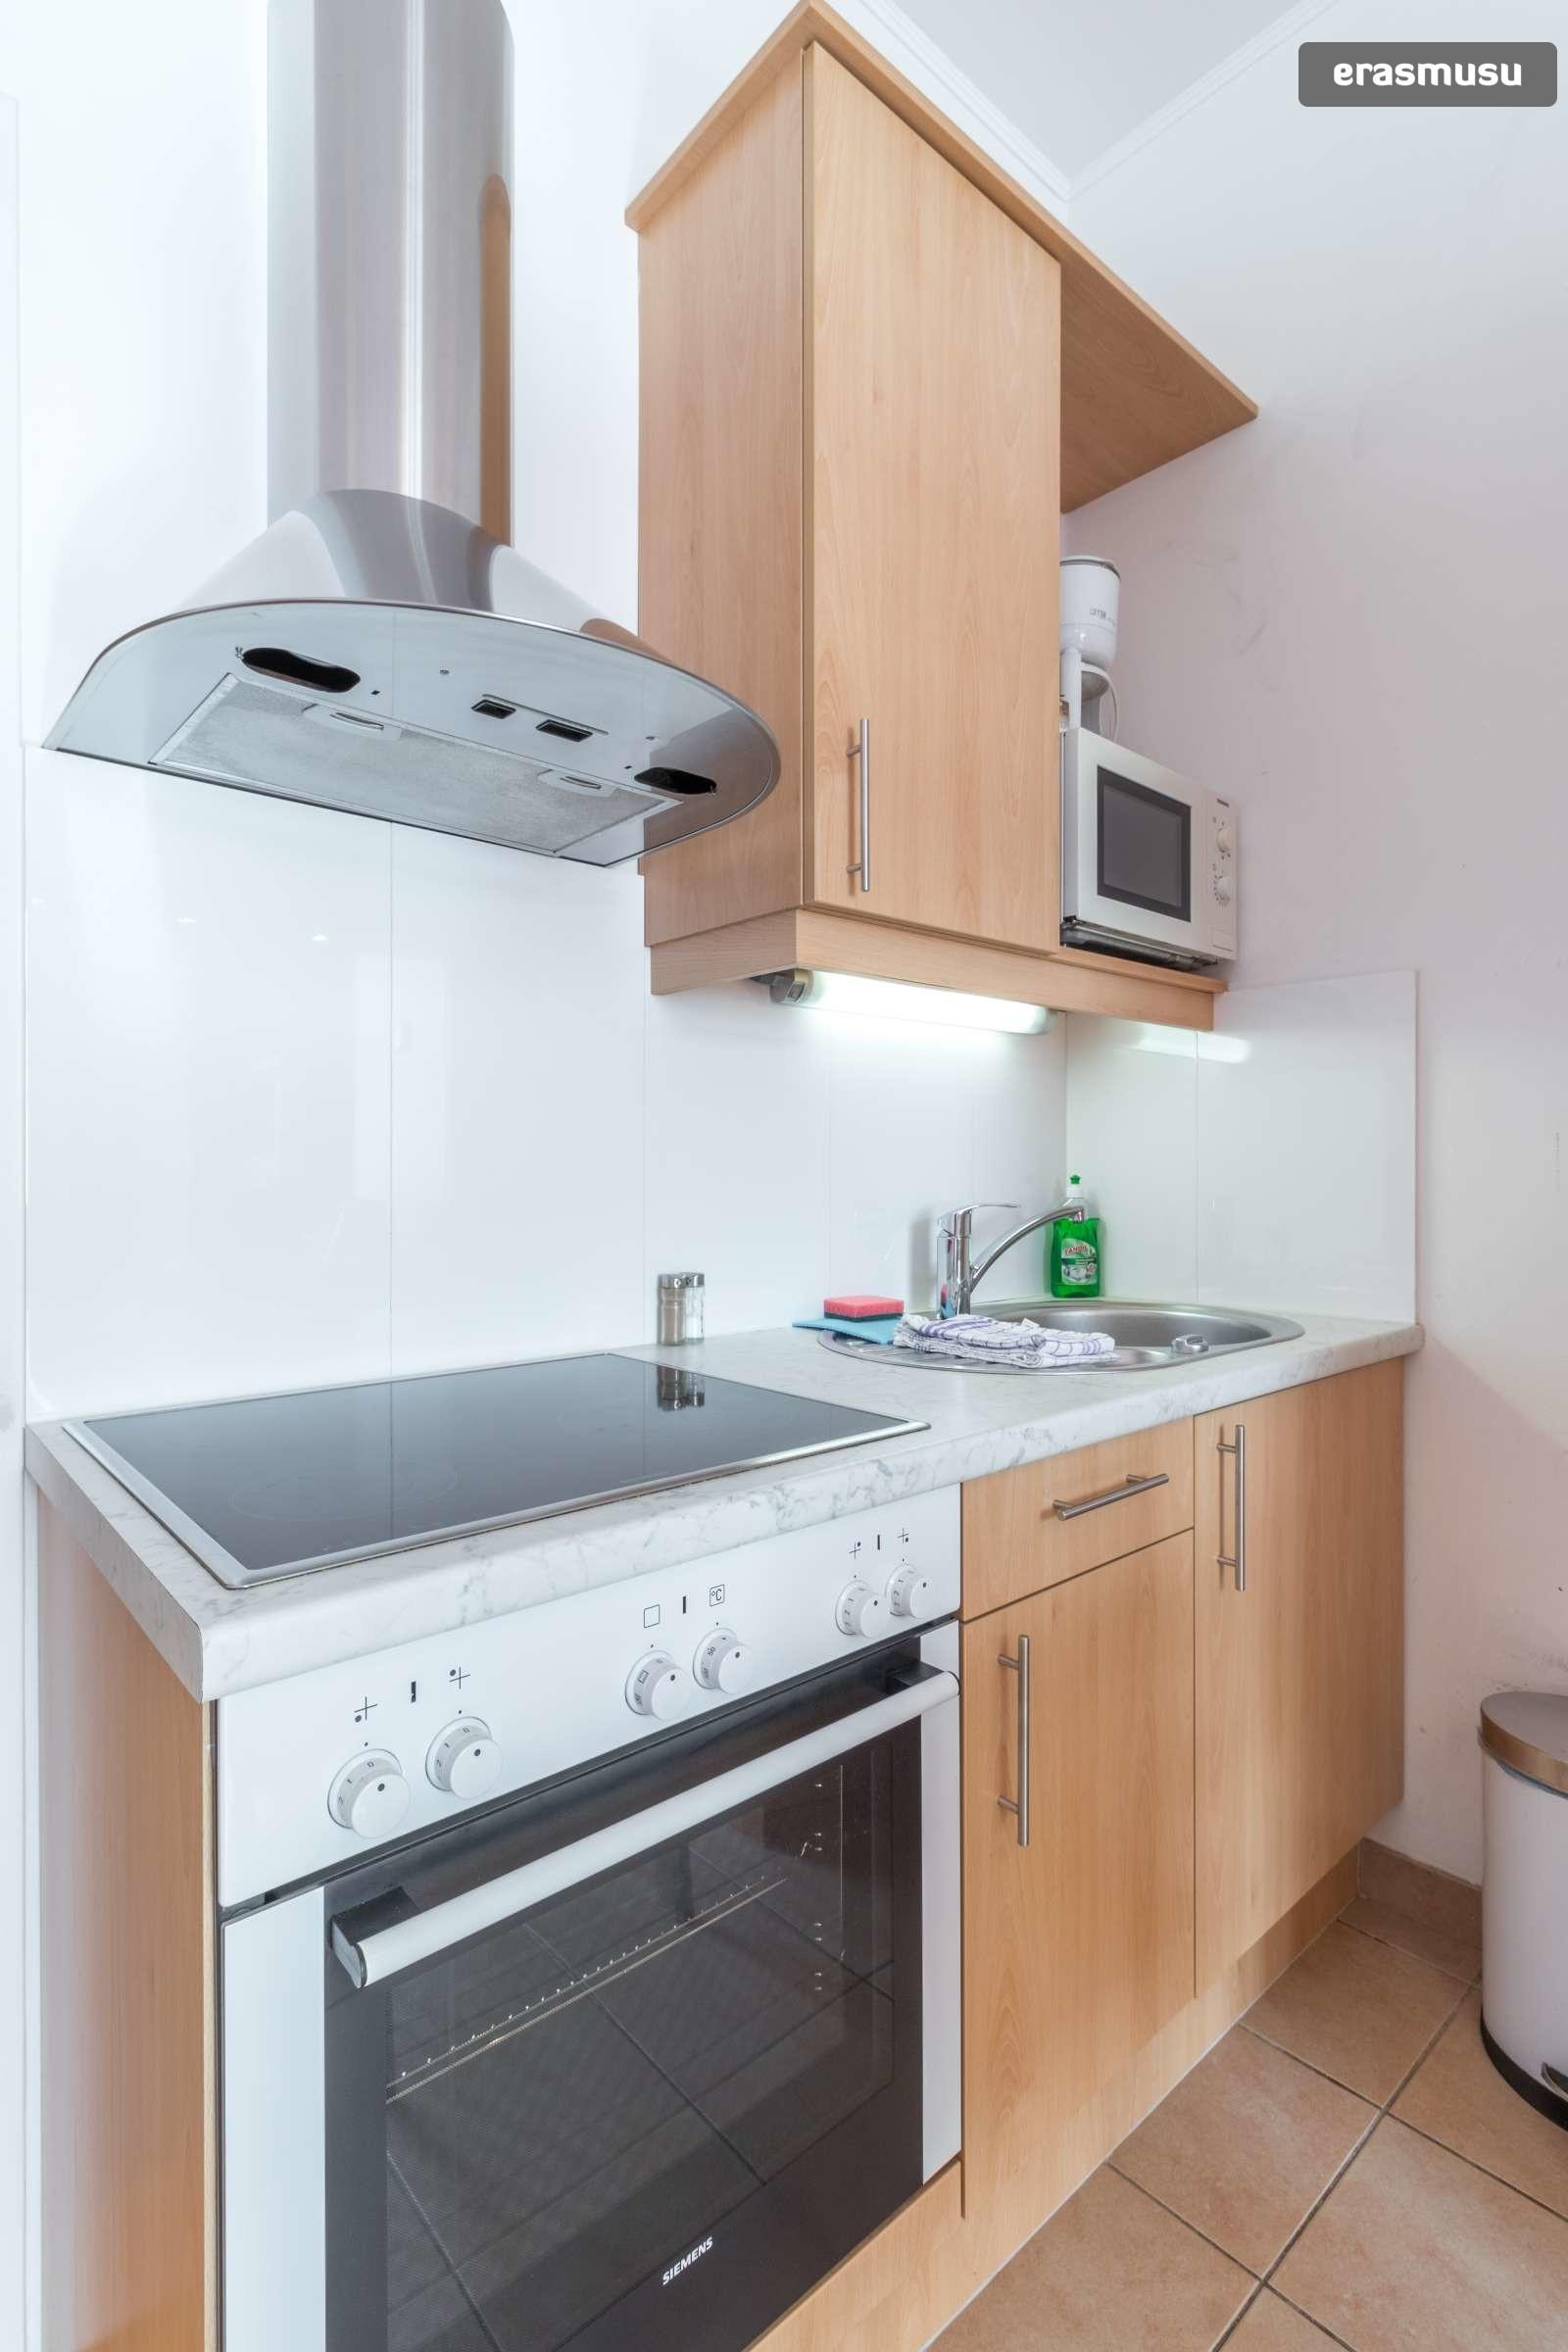 sunny-studio-apartment-rent-near-bohemian-prater-favoriten-0e6e1